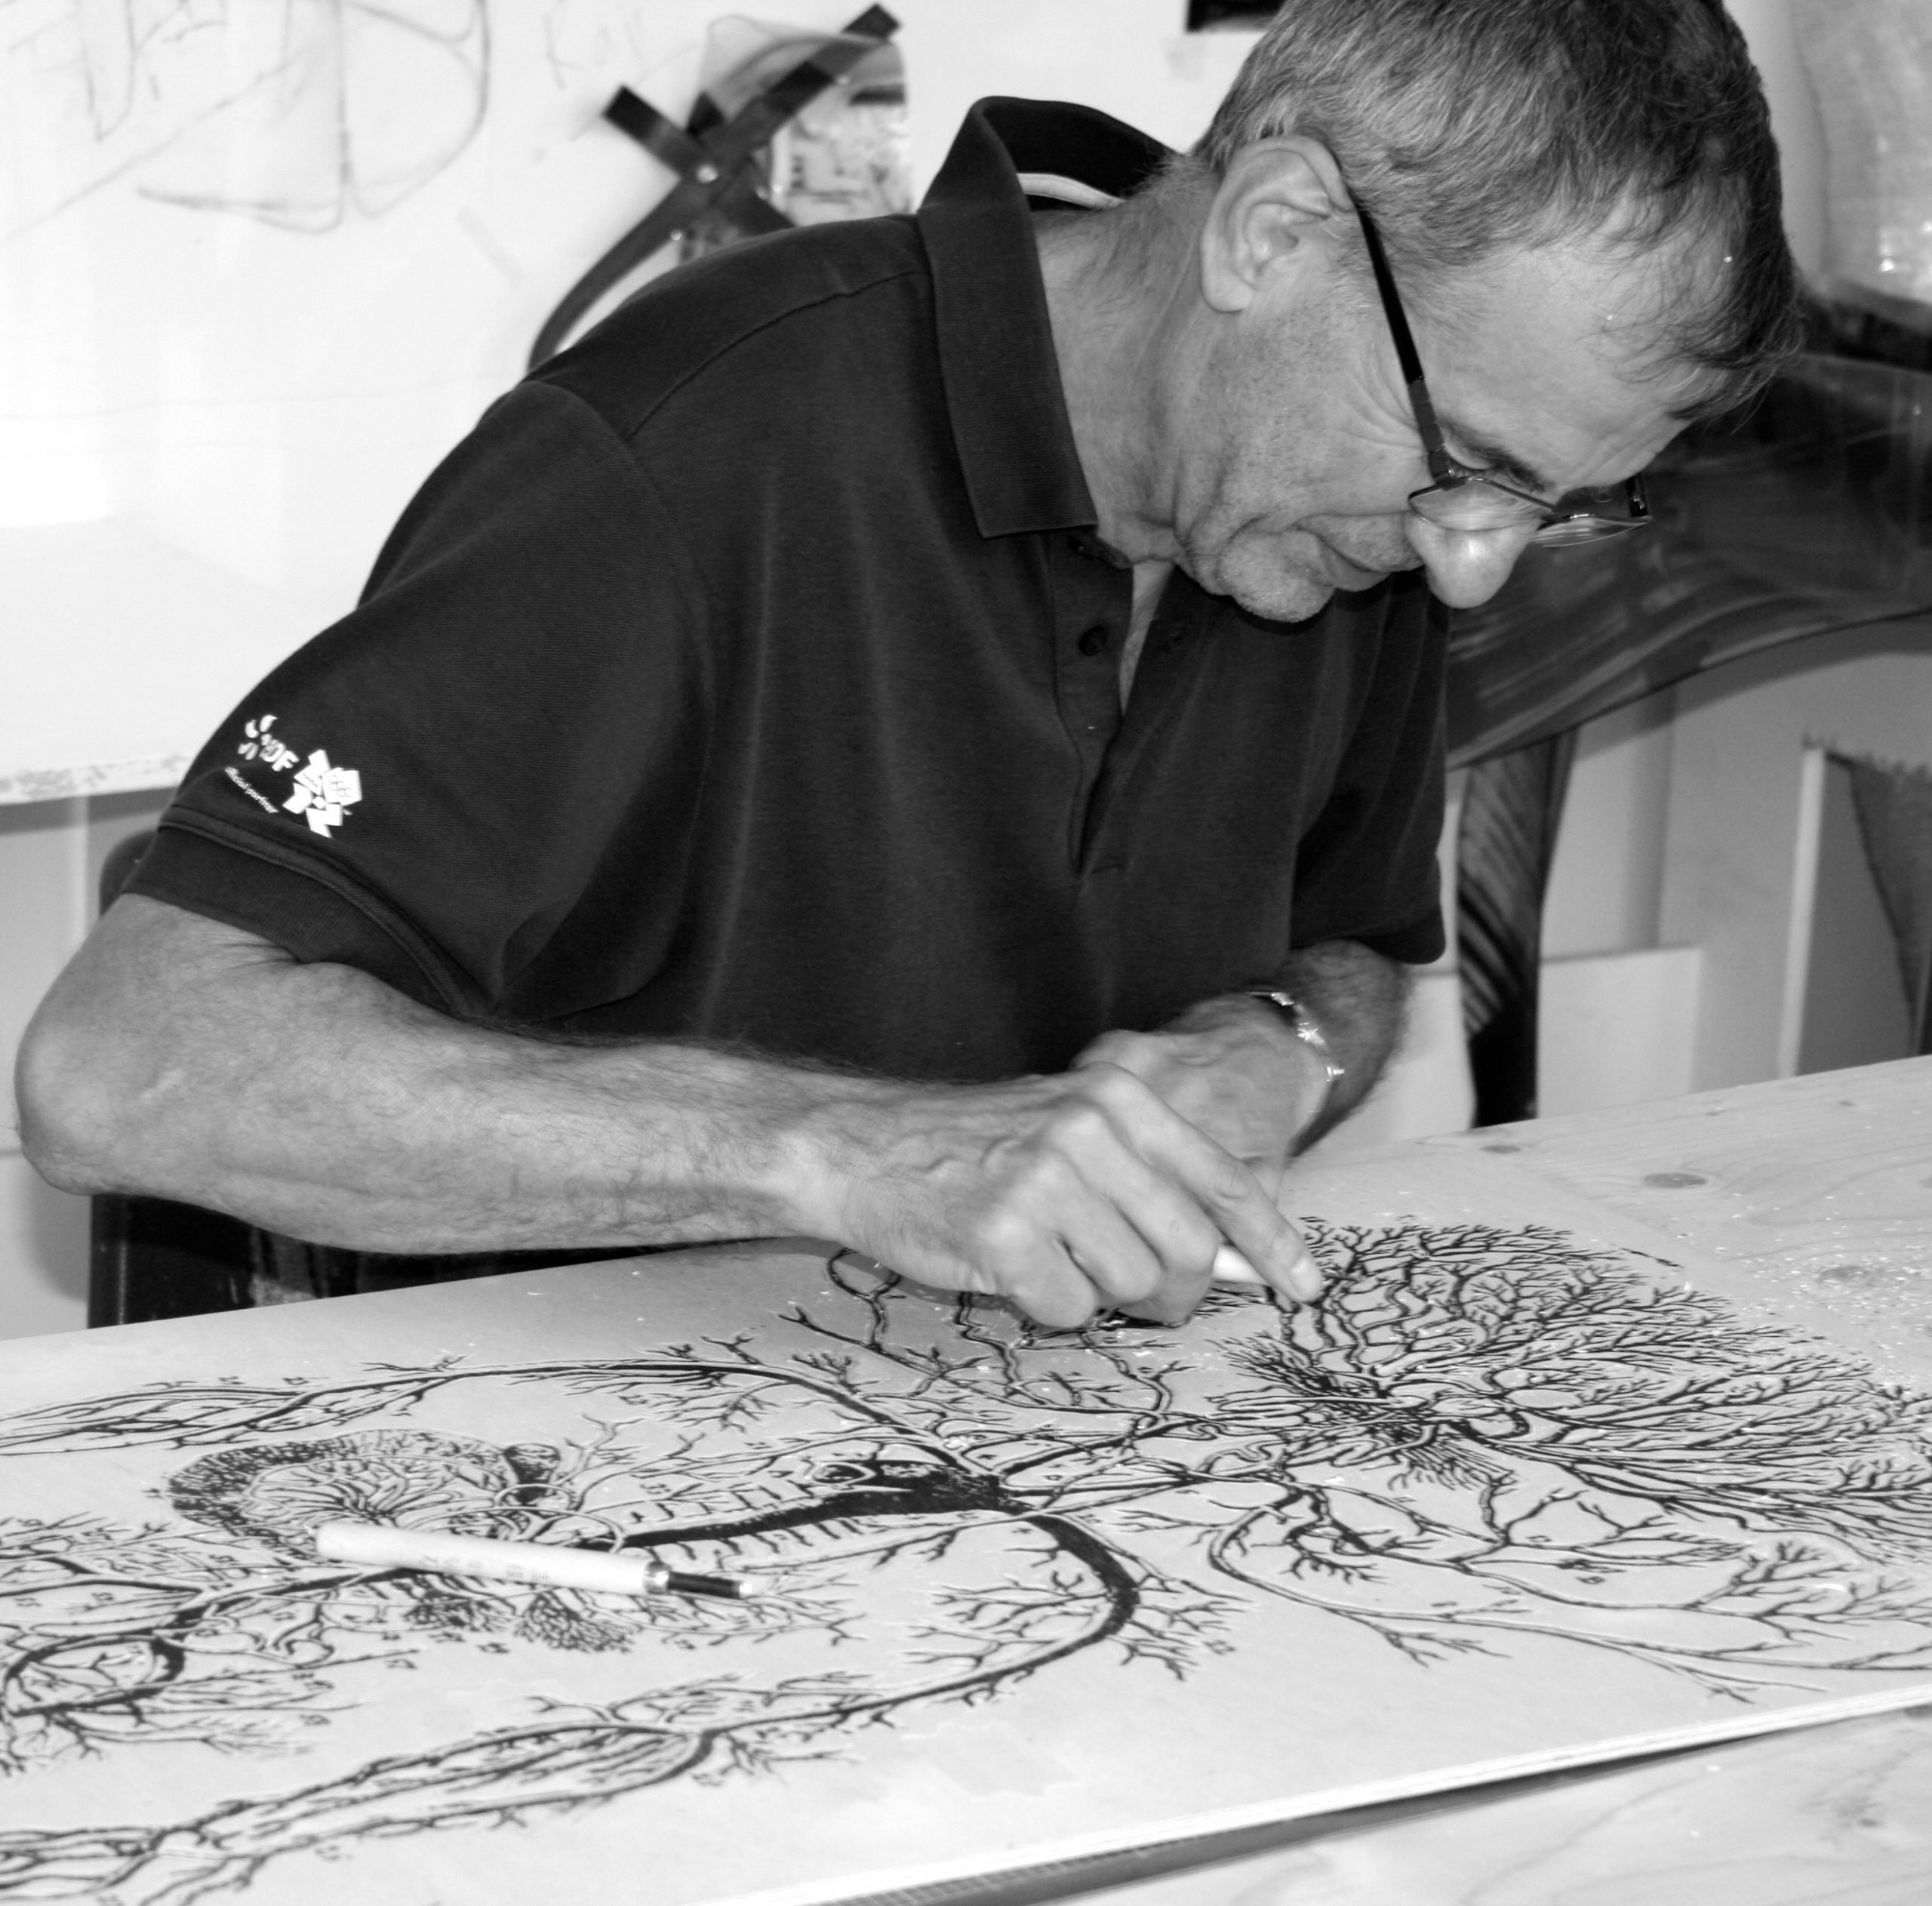 Phil Barton